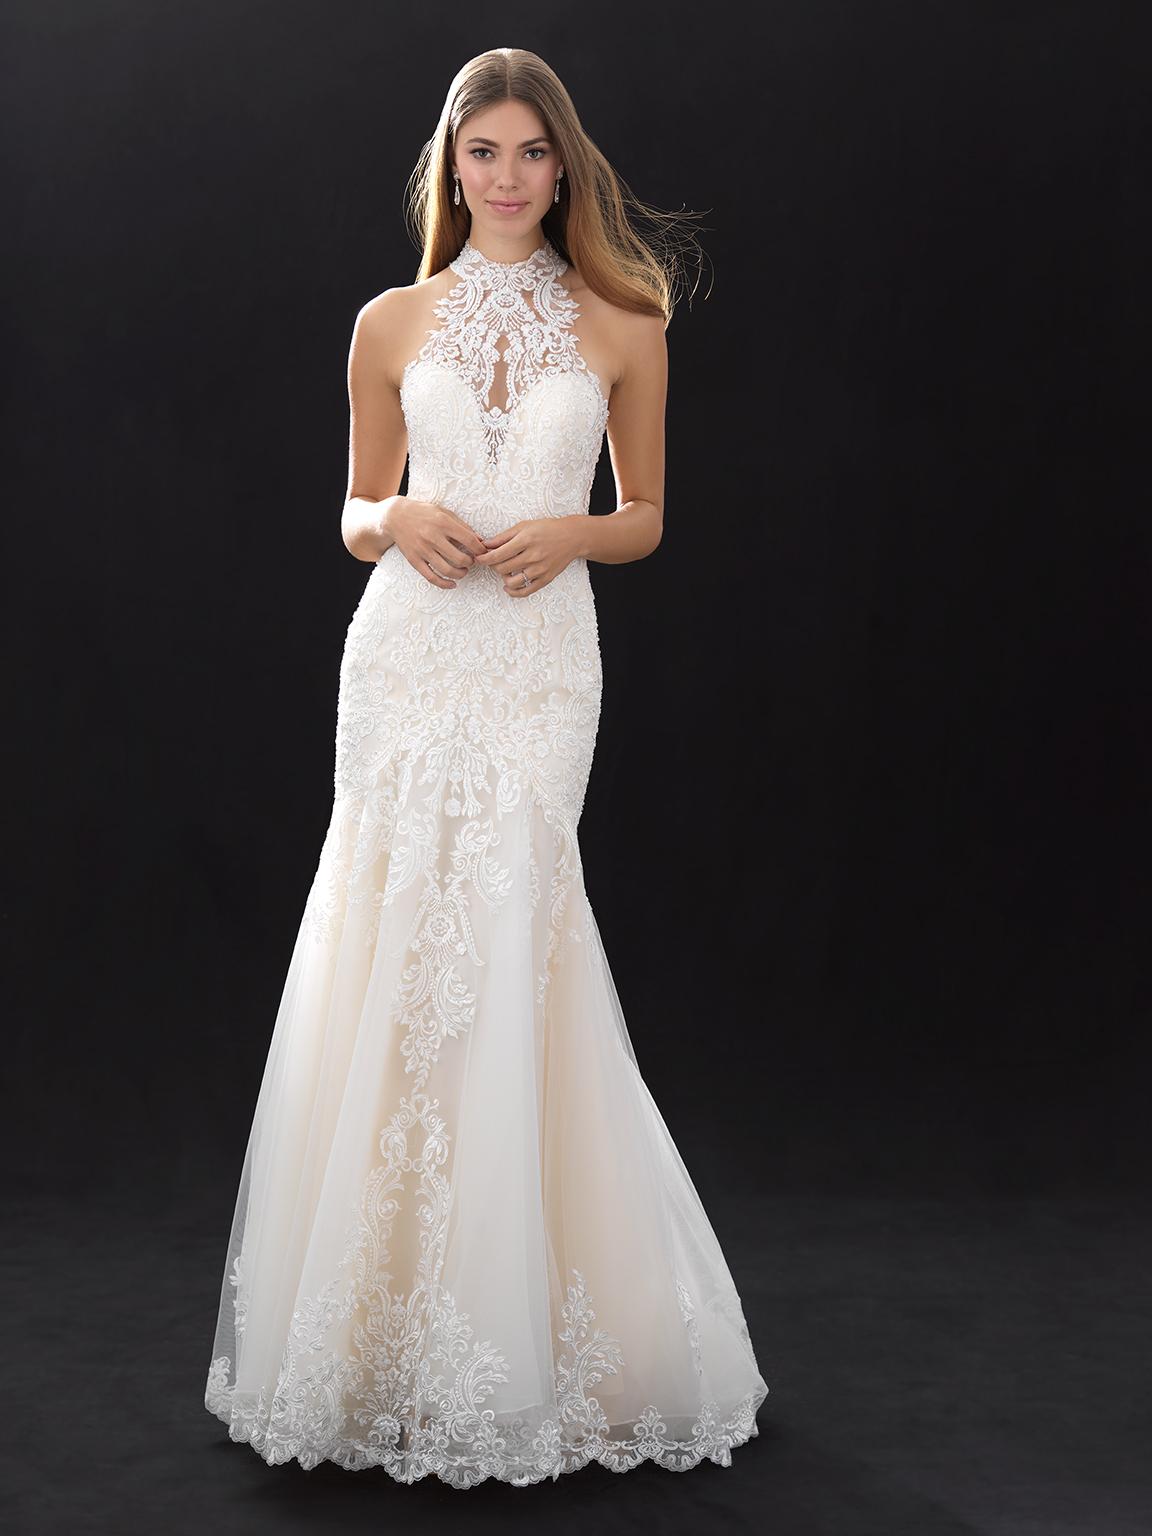 modern plus size wedding dresses photo - 1